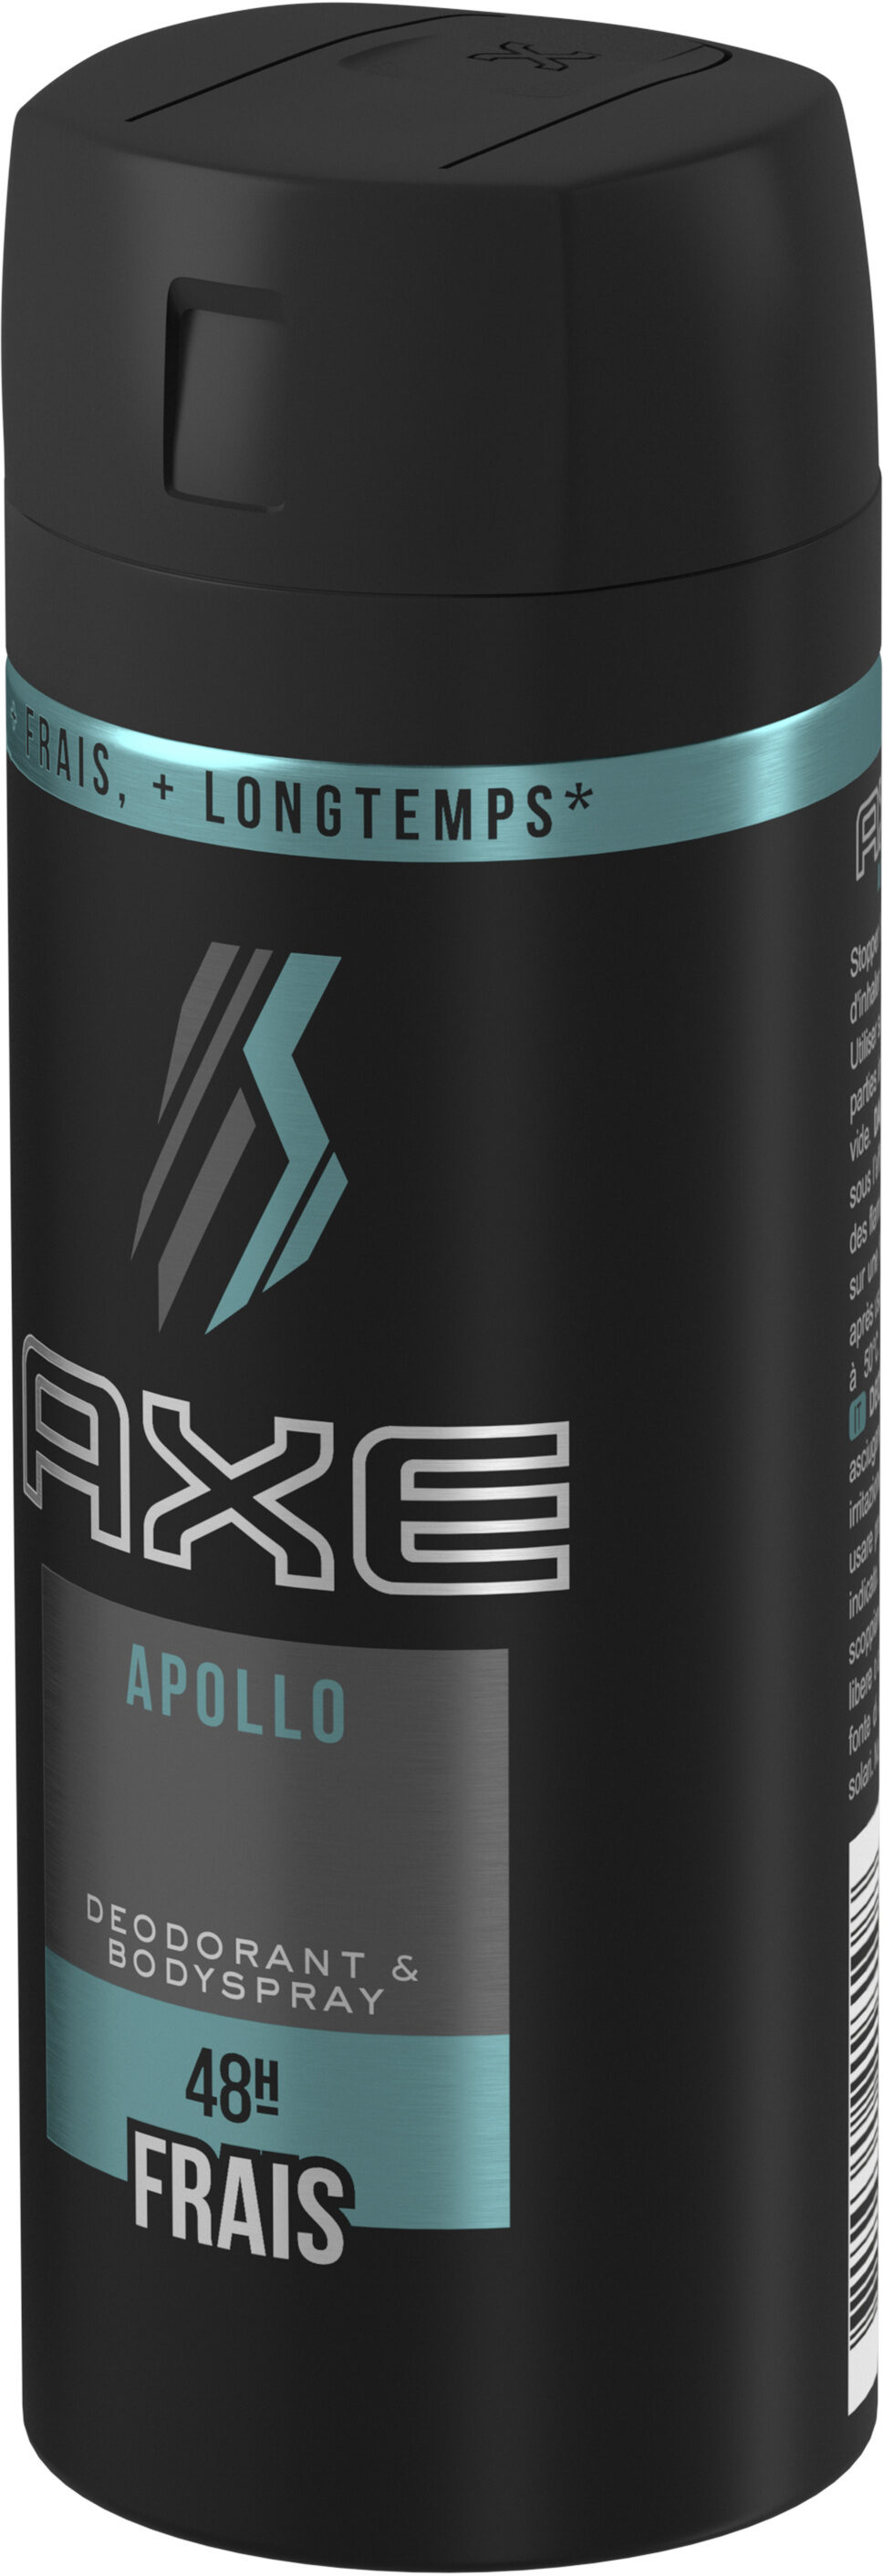 AXE Déodorant Homme Spray Apollo Frais 48h - Product - fr